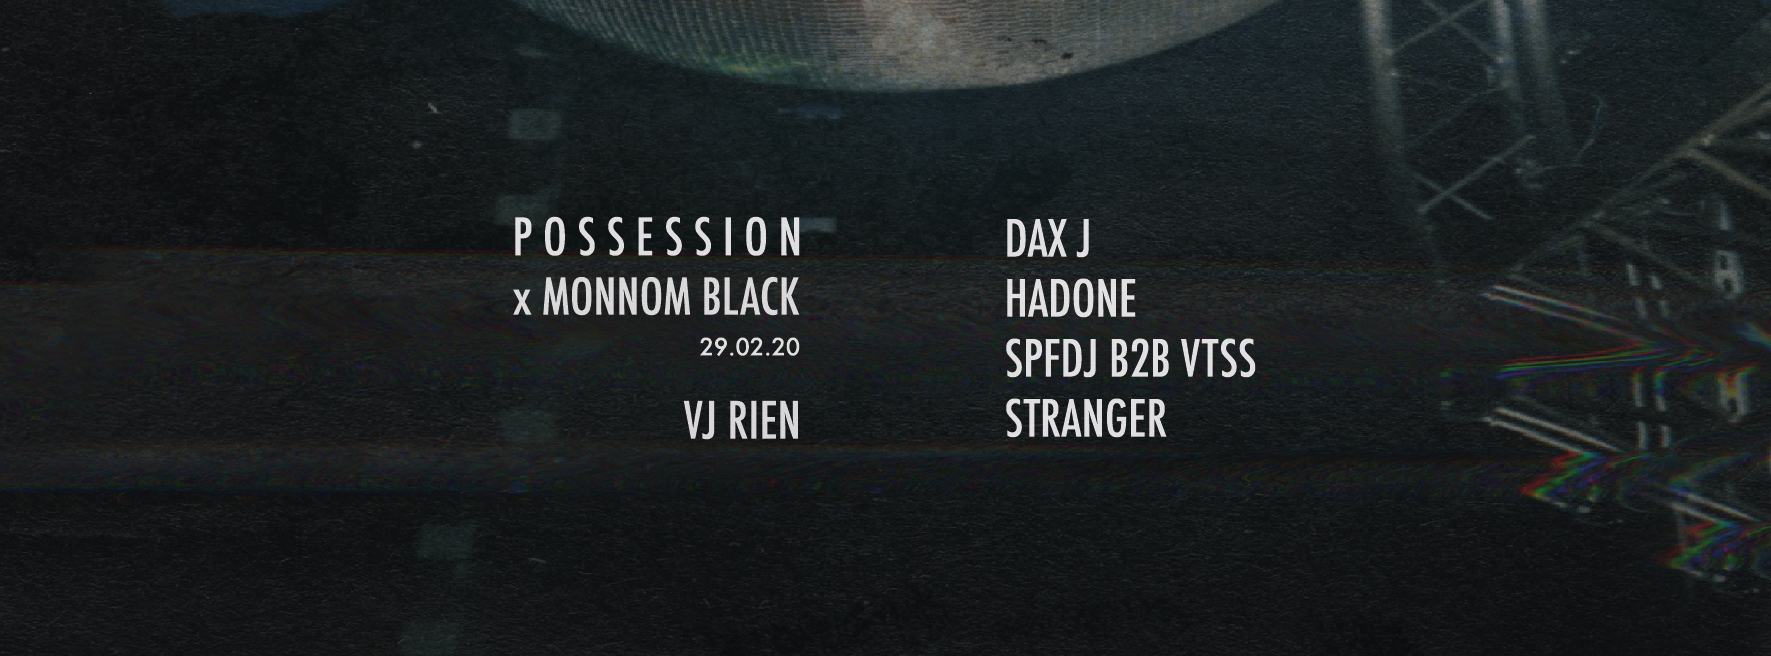 Possession x Monnom Black